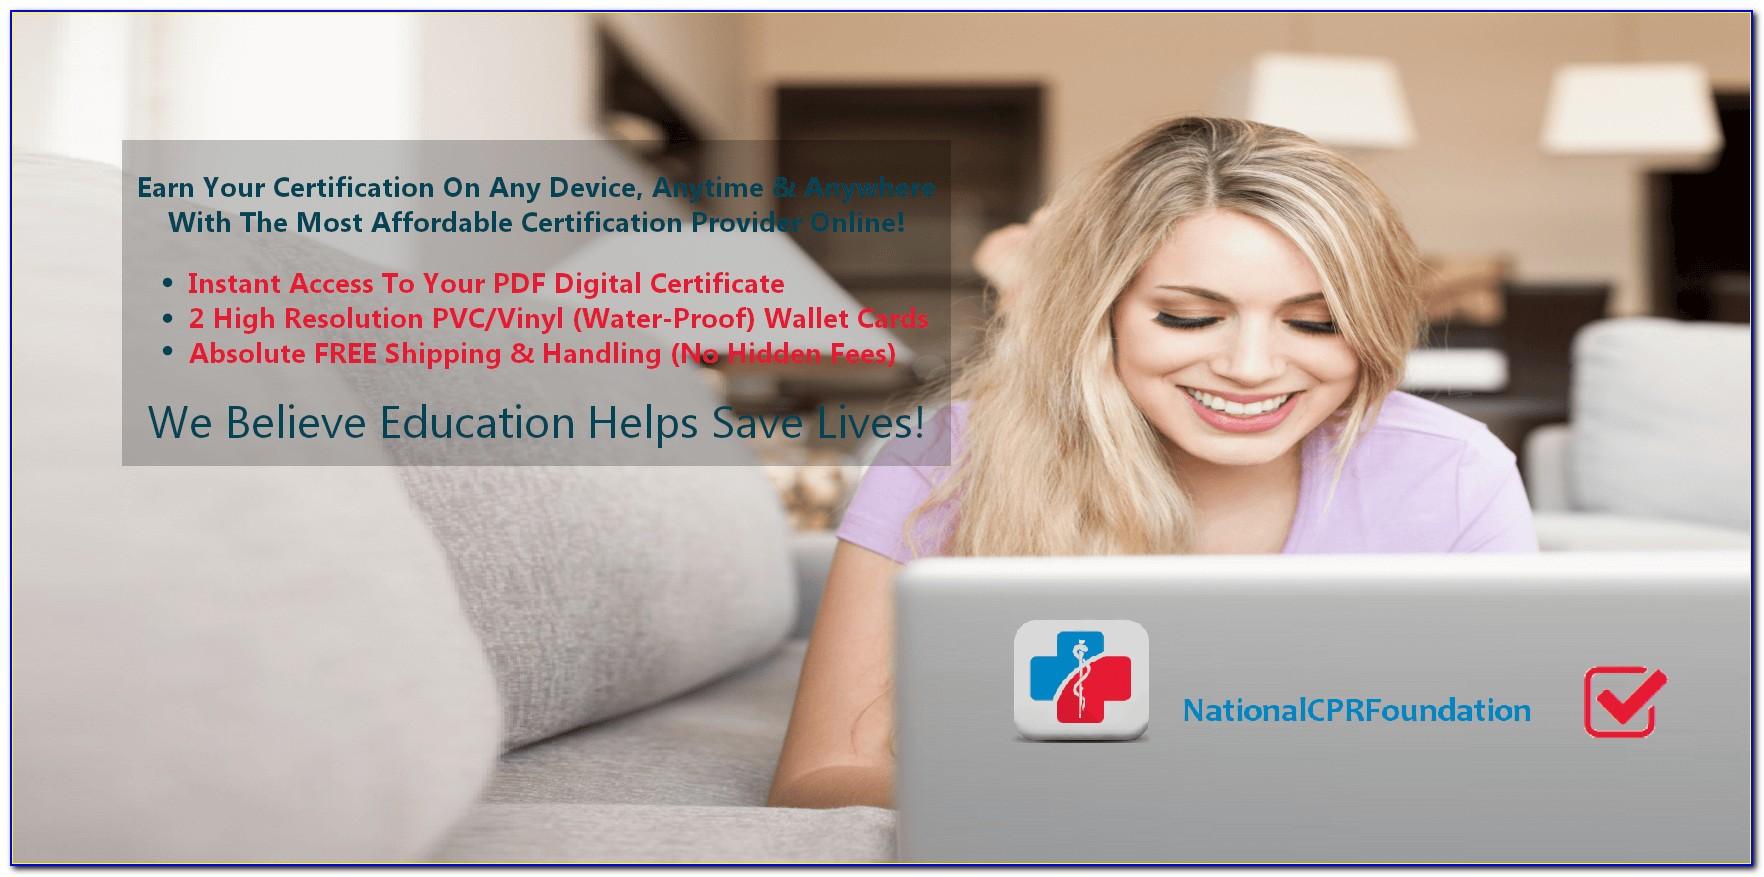 Cpr Bls Certification Renewal Online